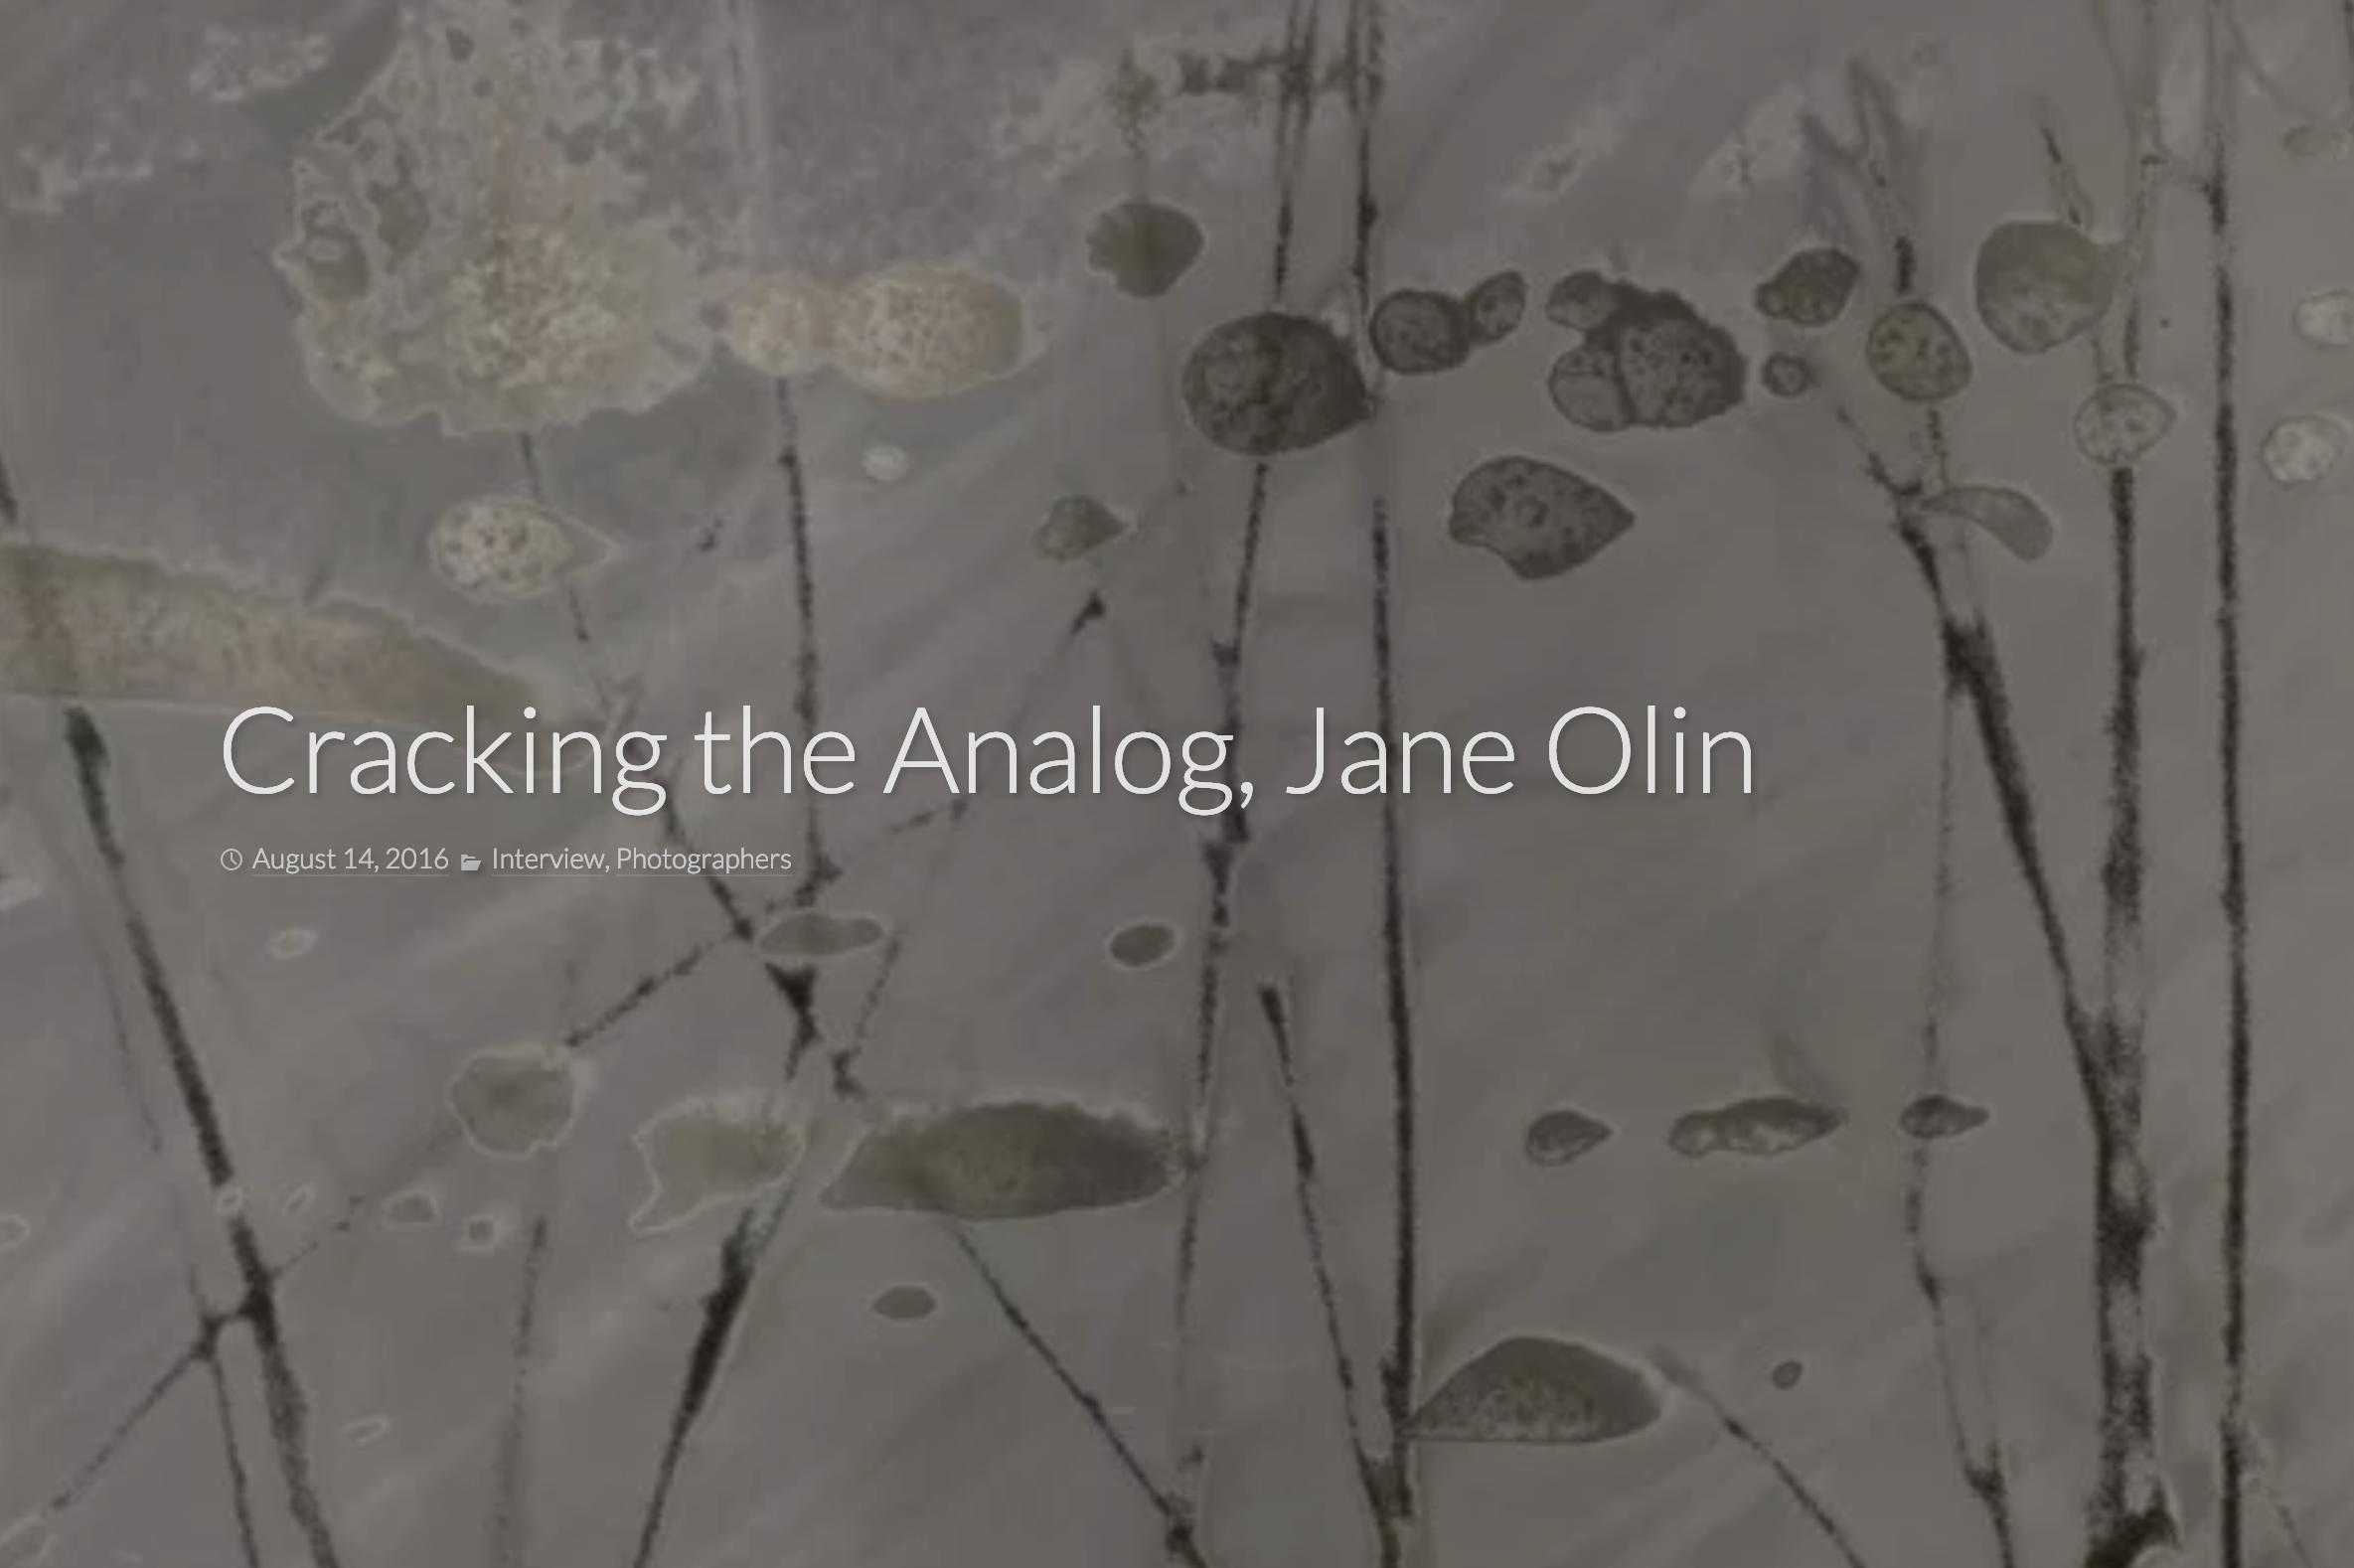 cracking-the-analog-jane-olin-rfotofolio.png